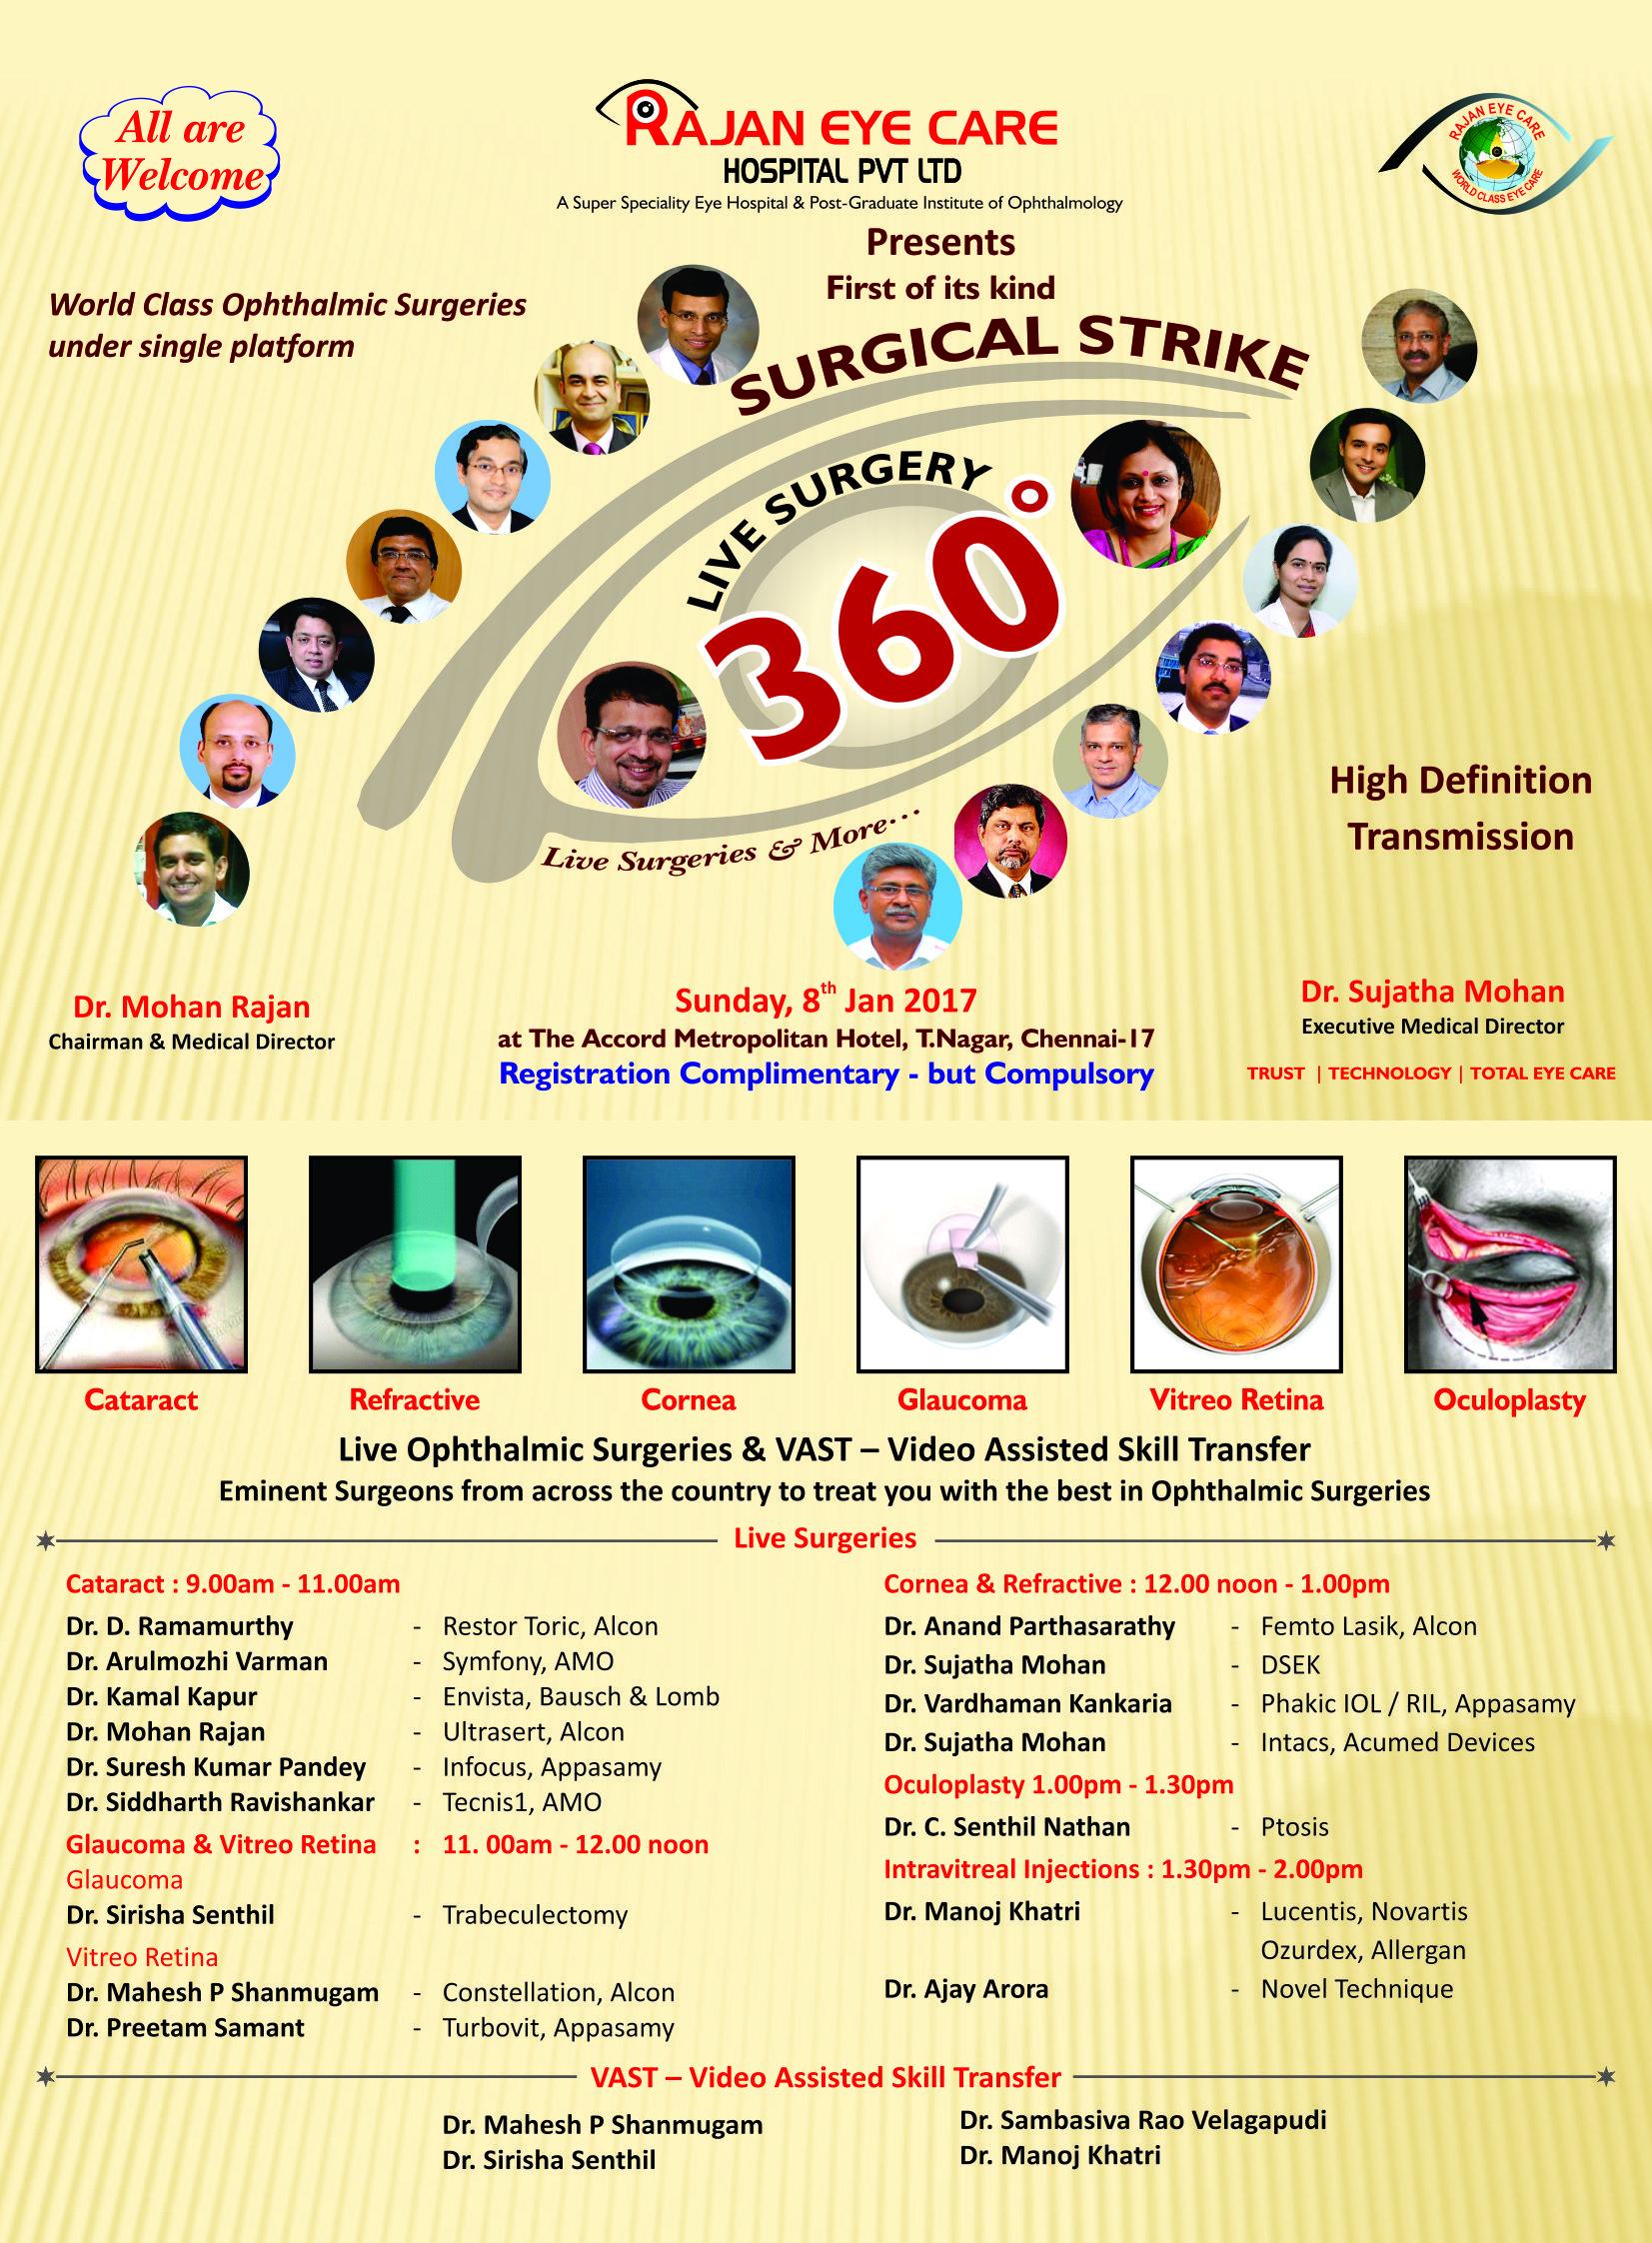 001-360-live-surgery-2017-pg1